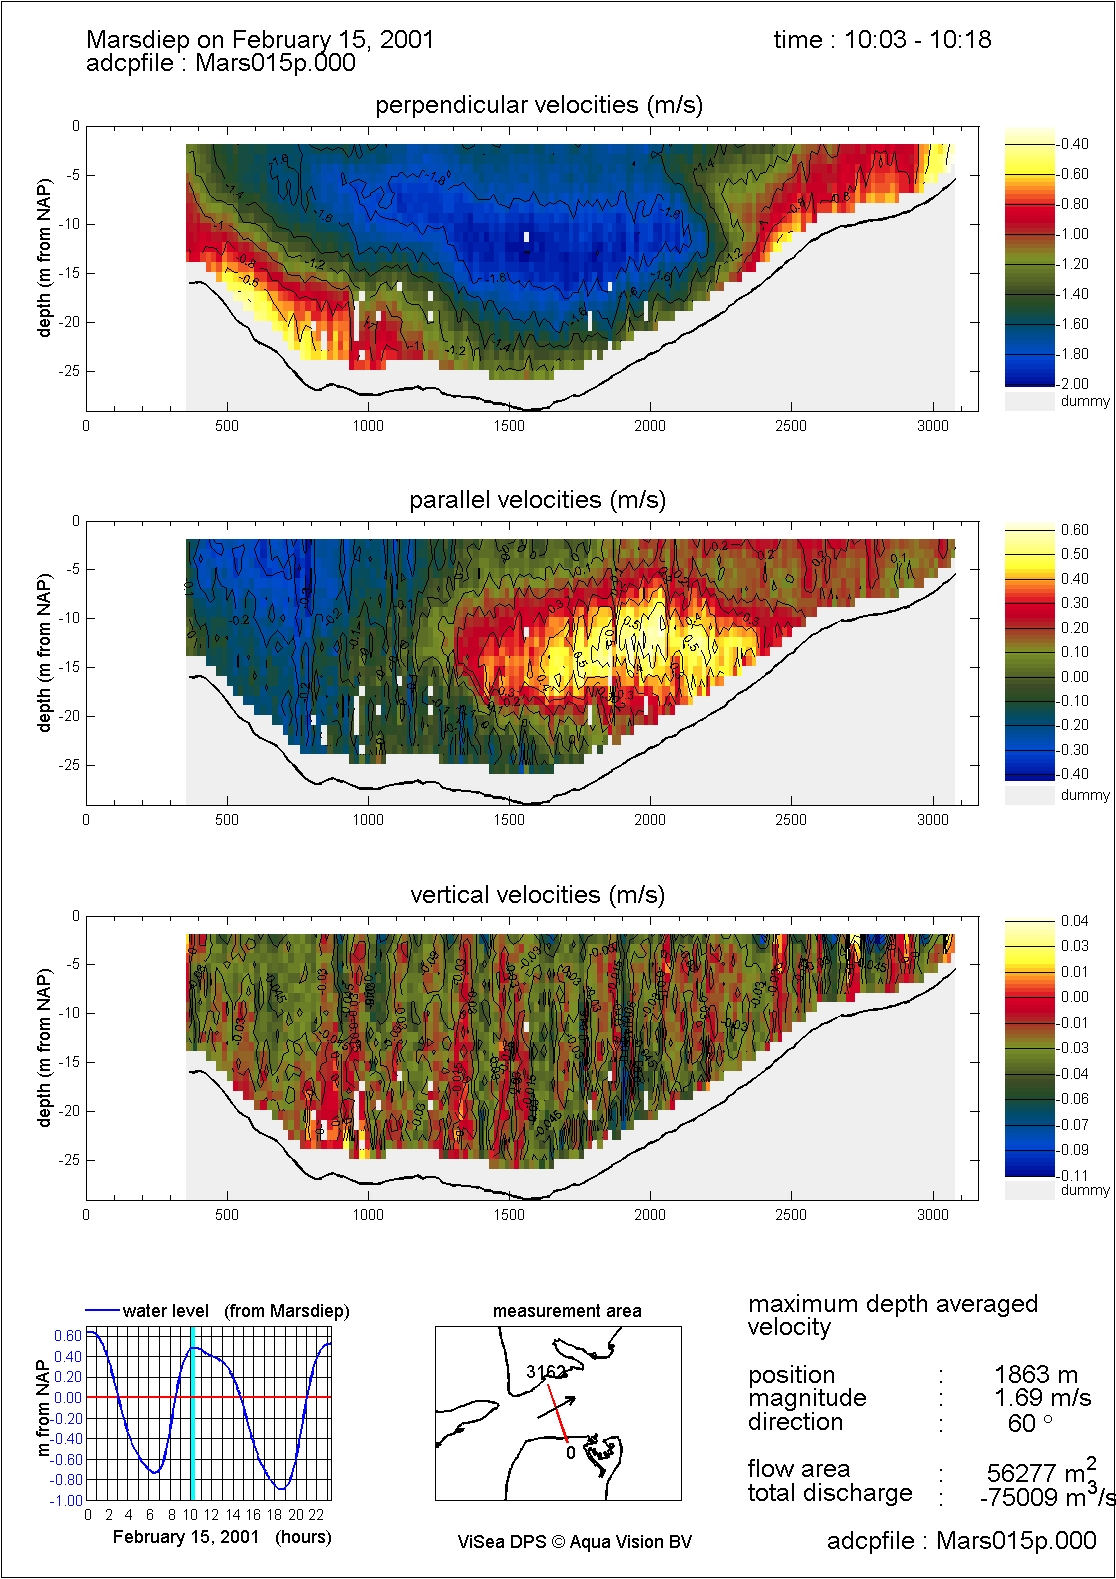 ViSea DPS data